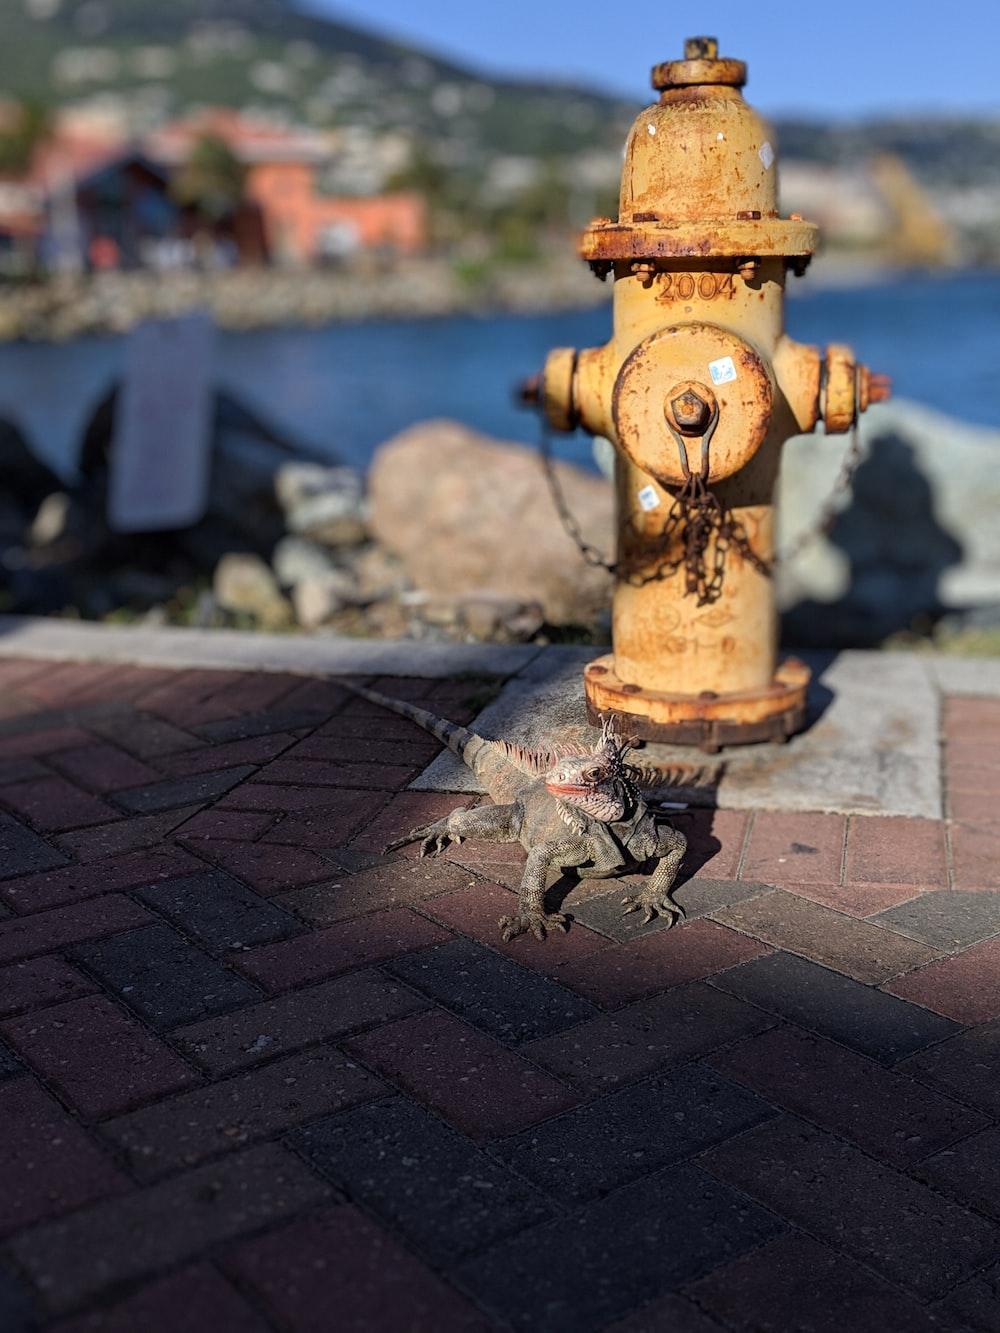 lizard next to fire hydrant